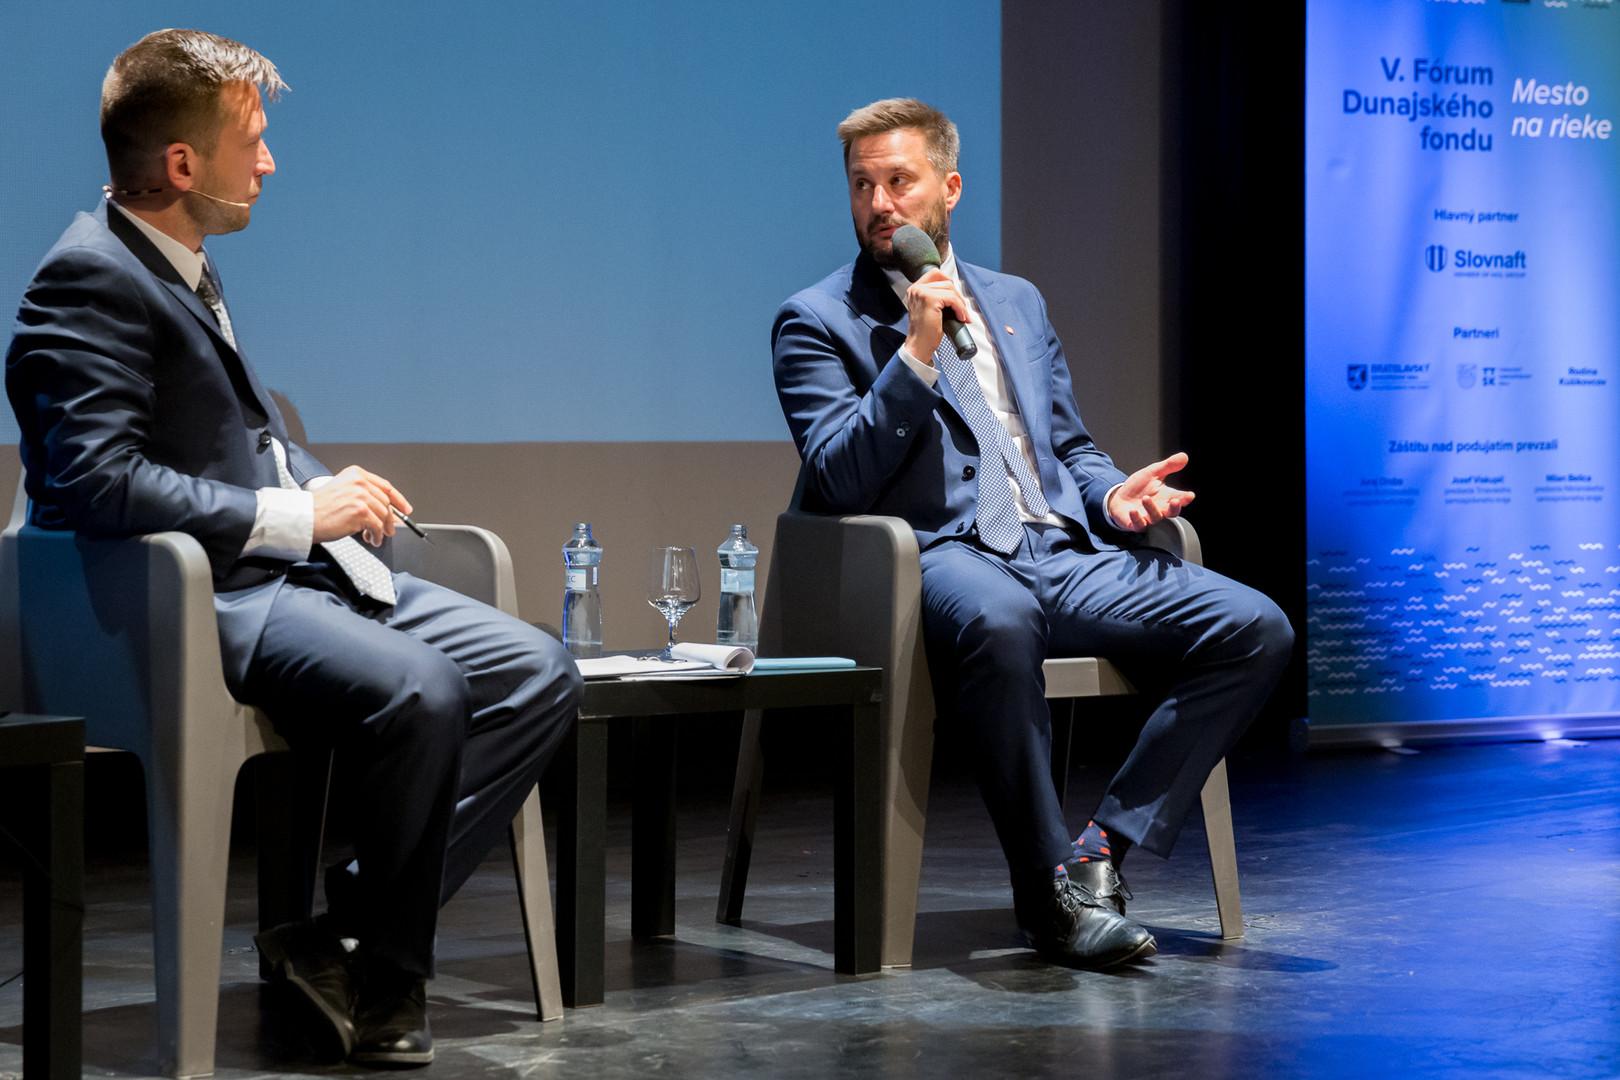 Forum Dunajskeho fondu_8686_web108.jpg